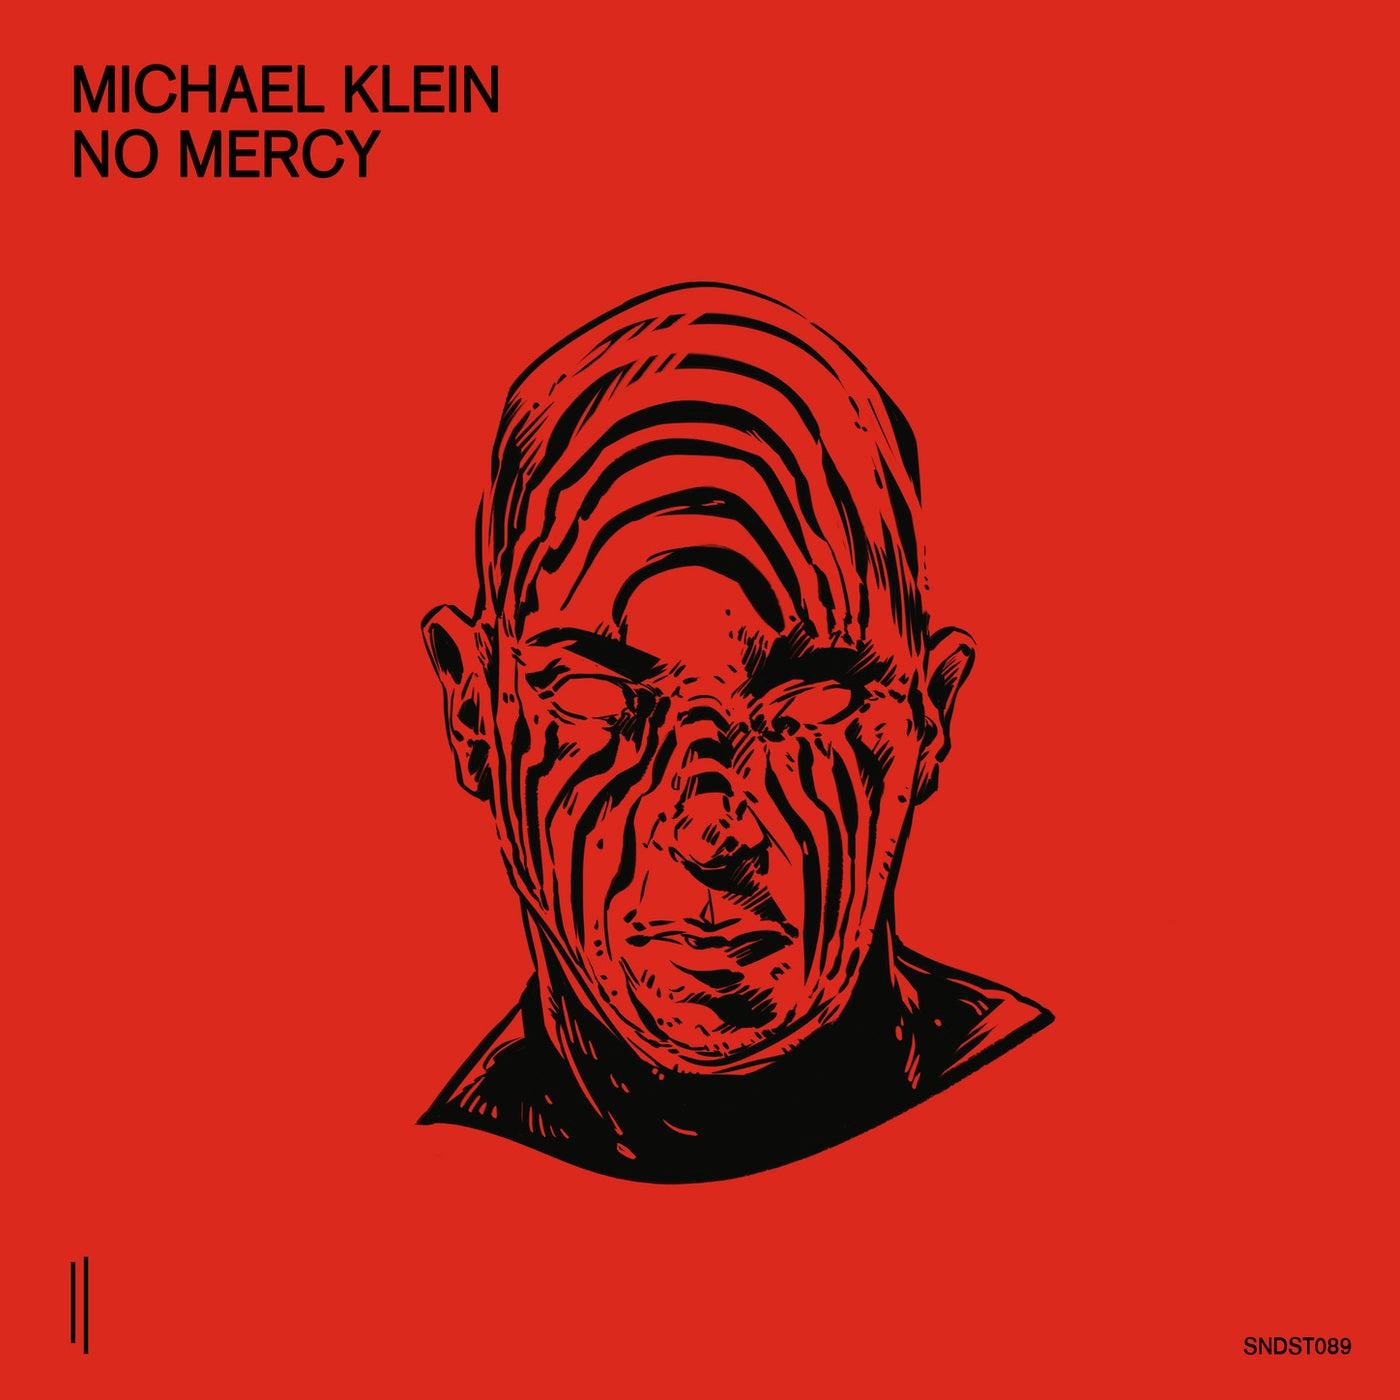 No Mercy (Original Mix)